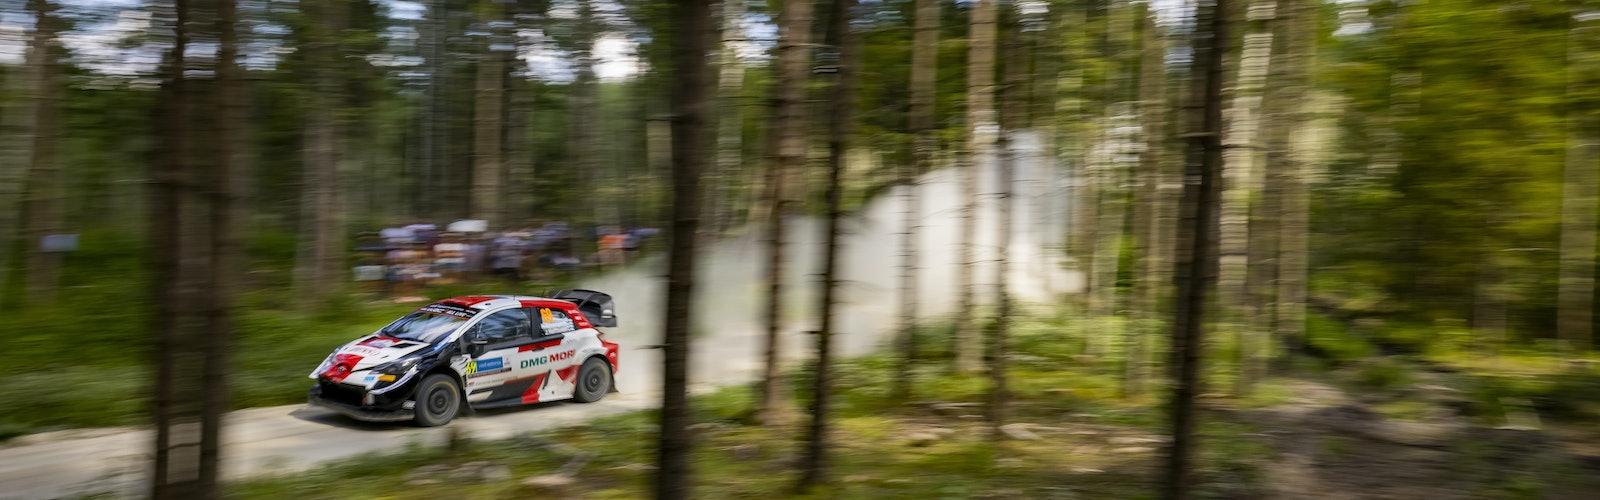 WRC_2021_Rd.7_269